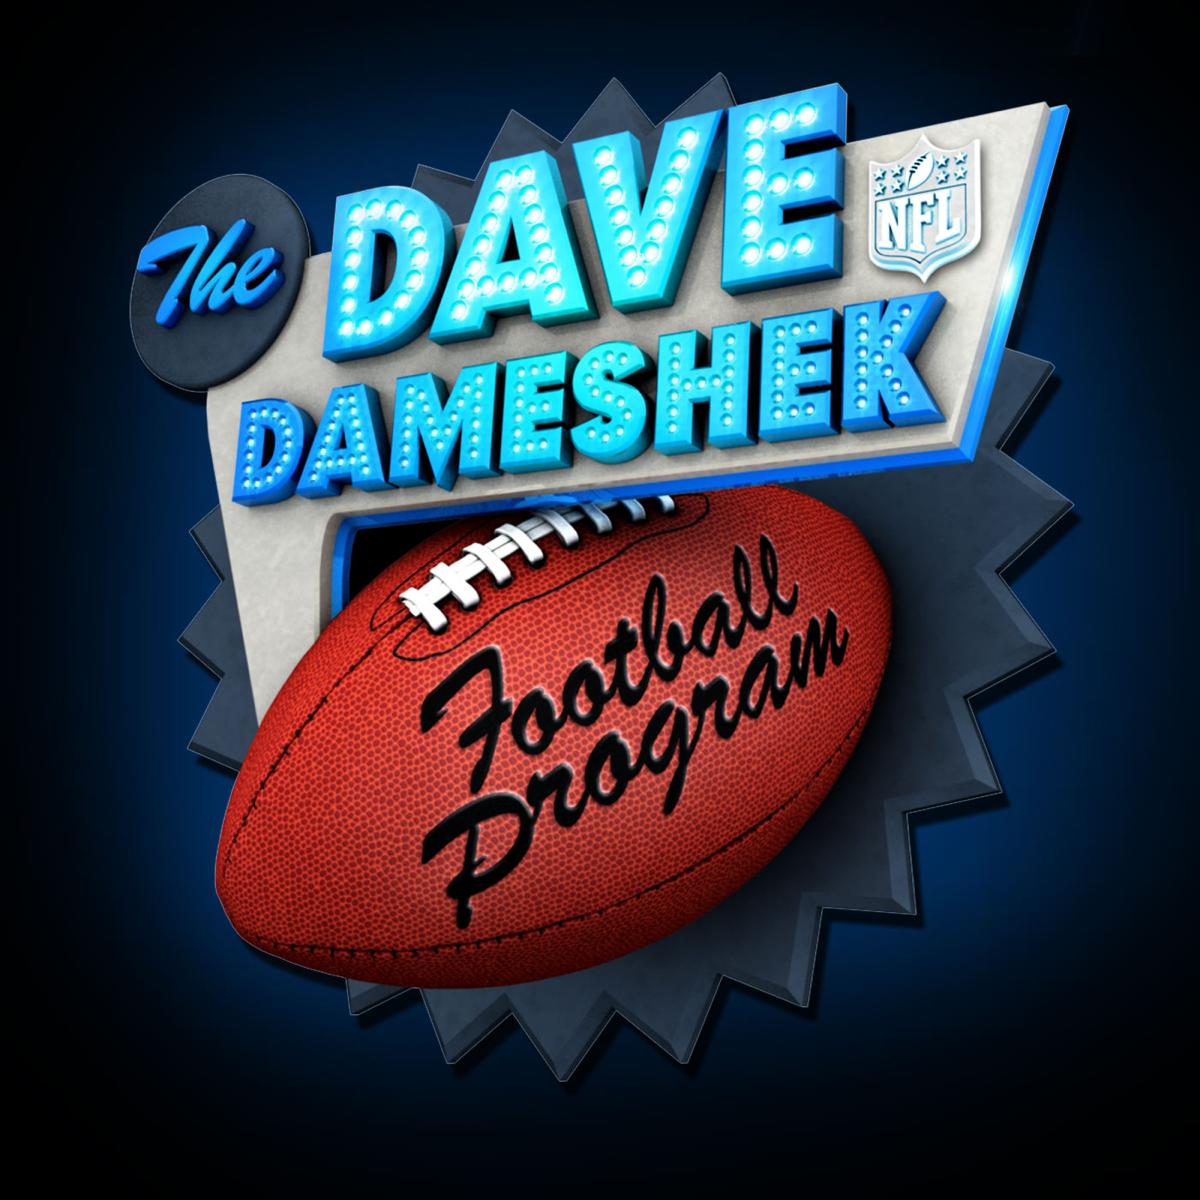 15e9f3003 Best episodes of NFL: The Dave Dameshek Football Program | Podyssey Podcasts